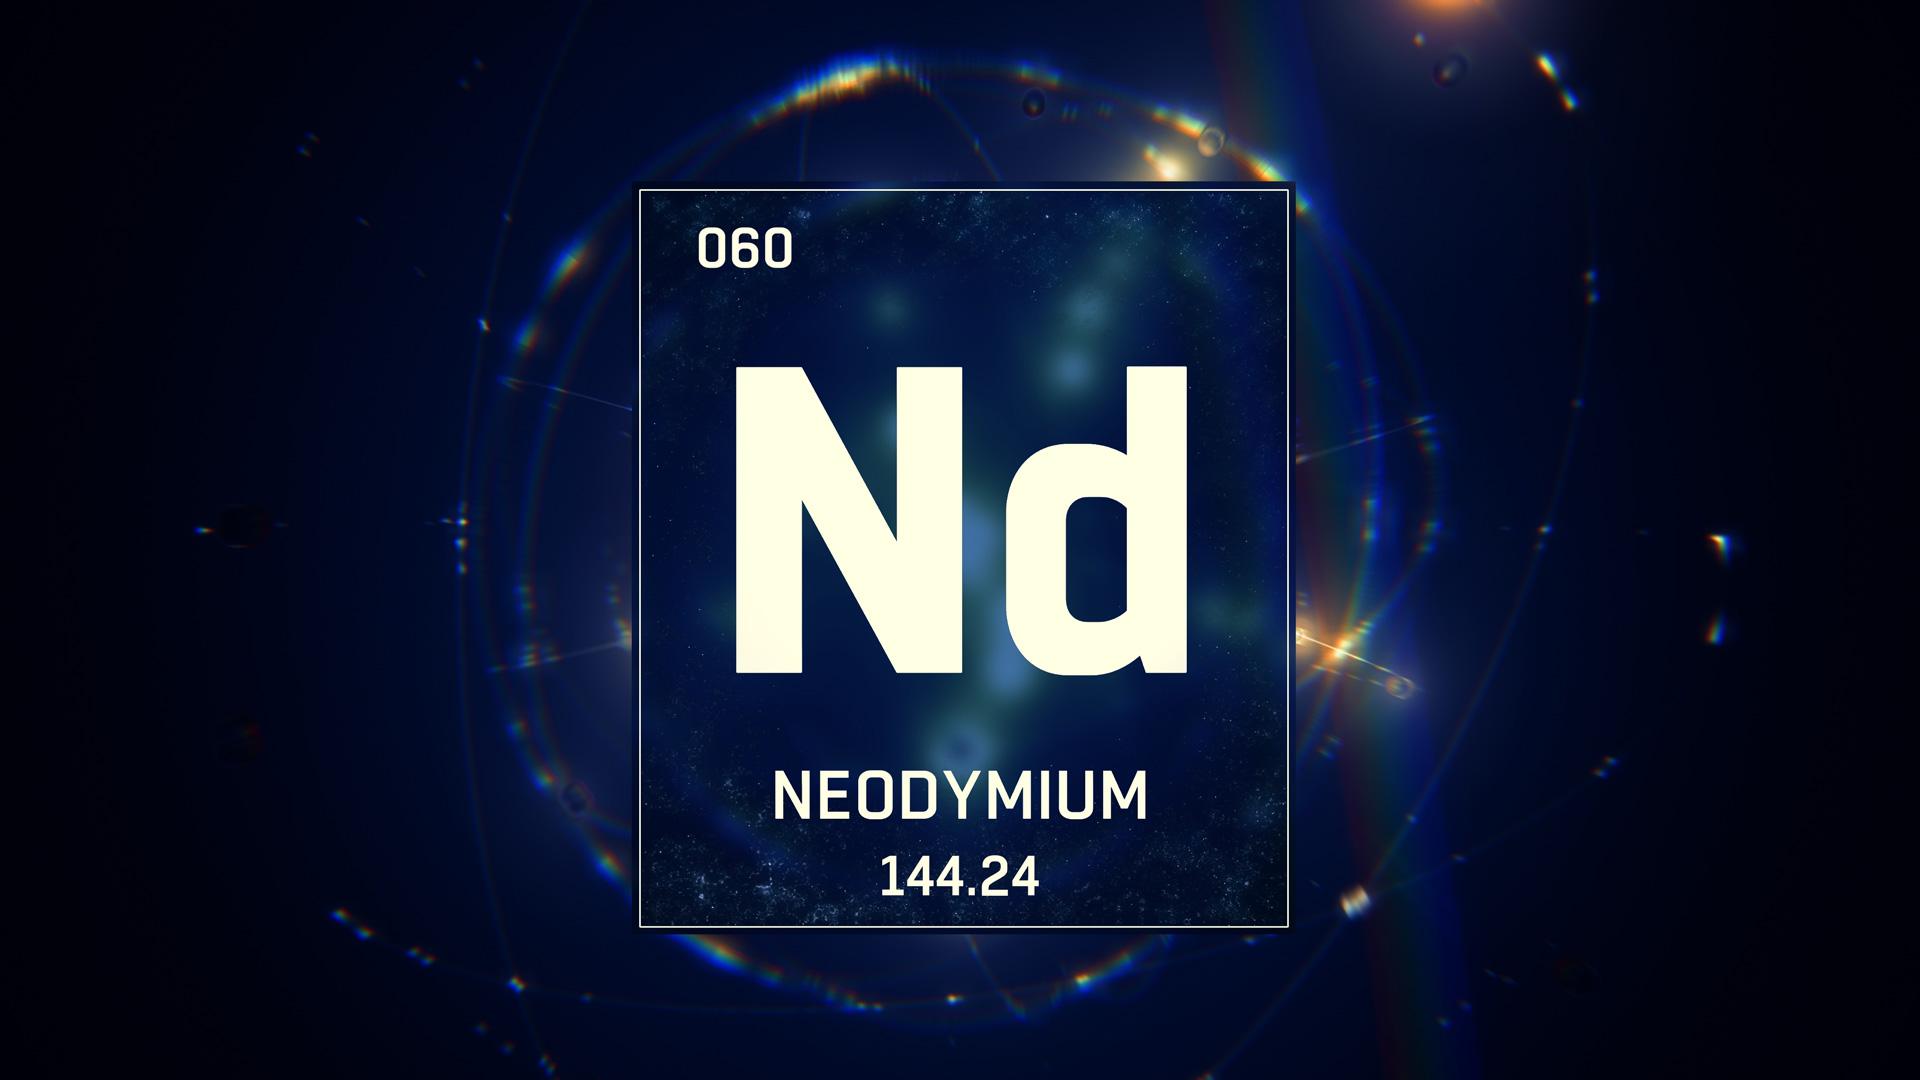 JV produces high quality neodymium metal alloy